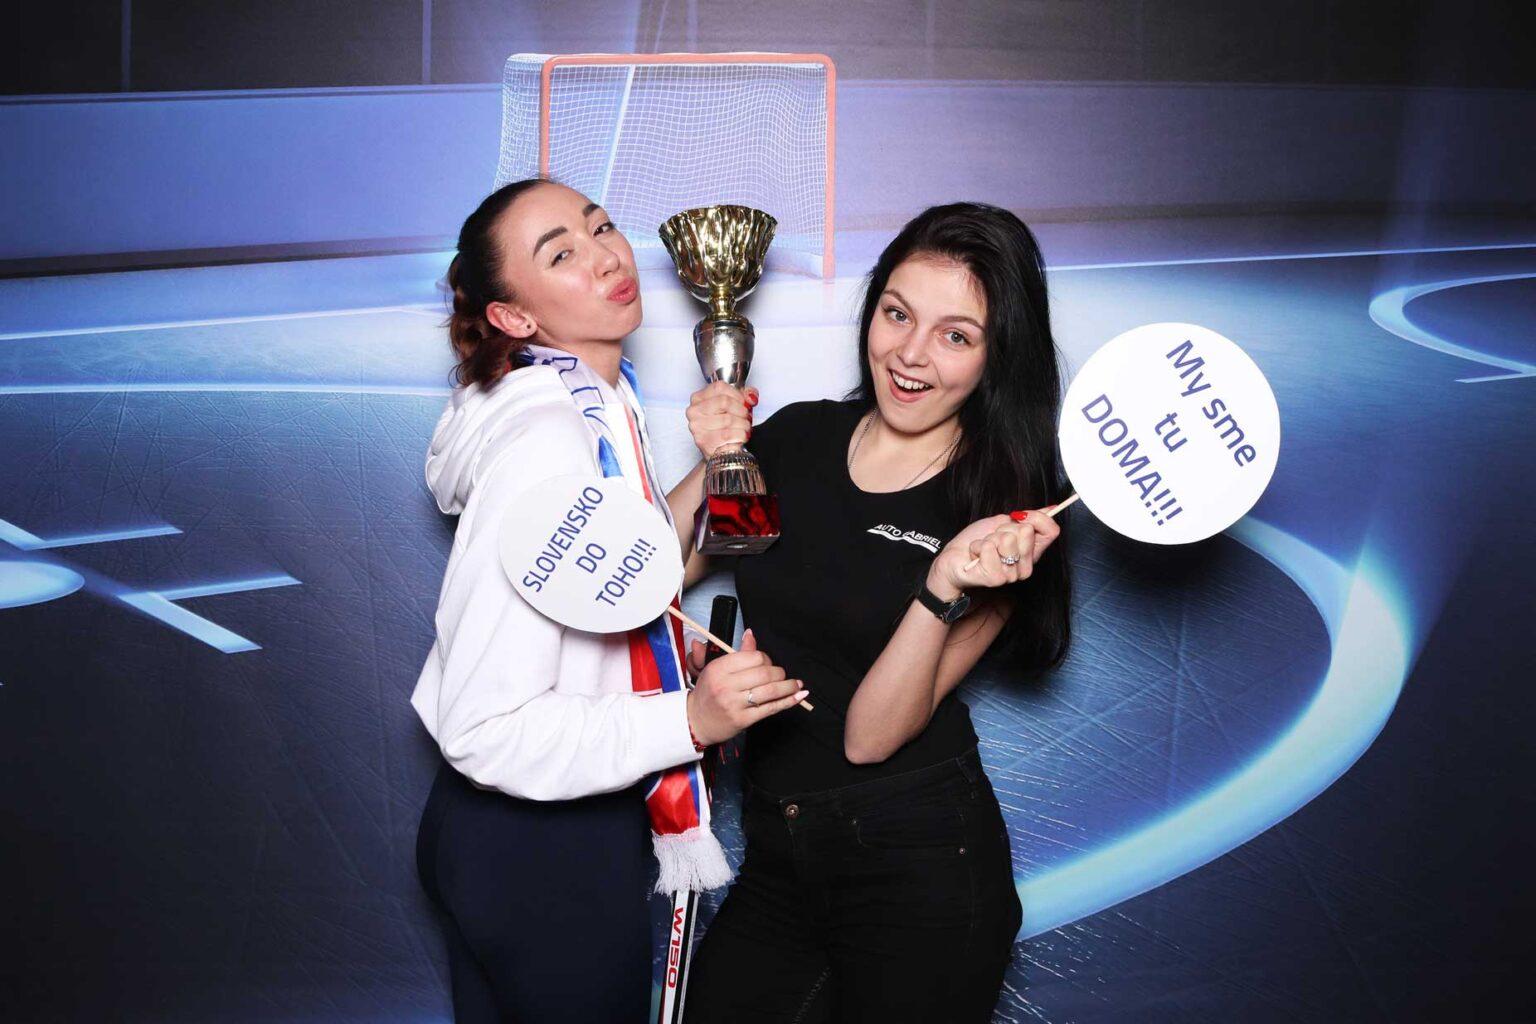 Hokejový fotokútik - rekvizity - pozadie Ice hockey - fotobox Bratislava.